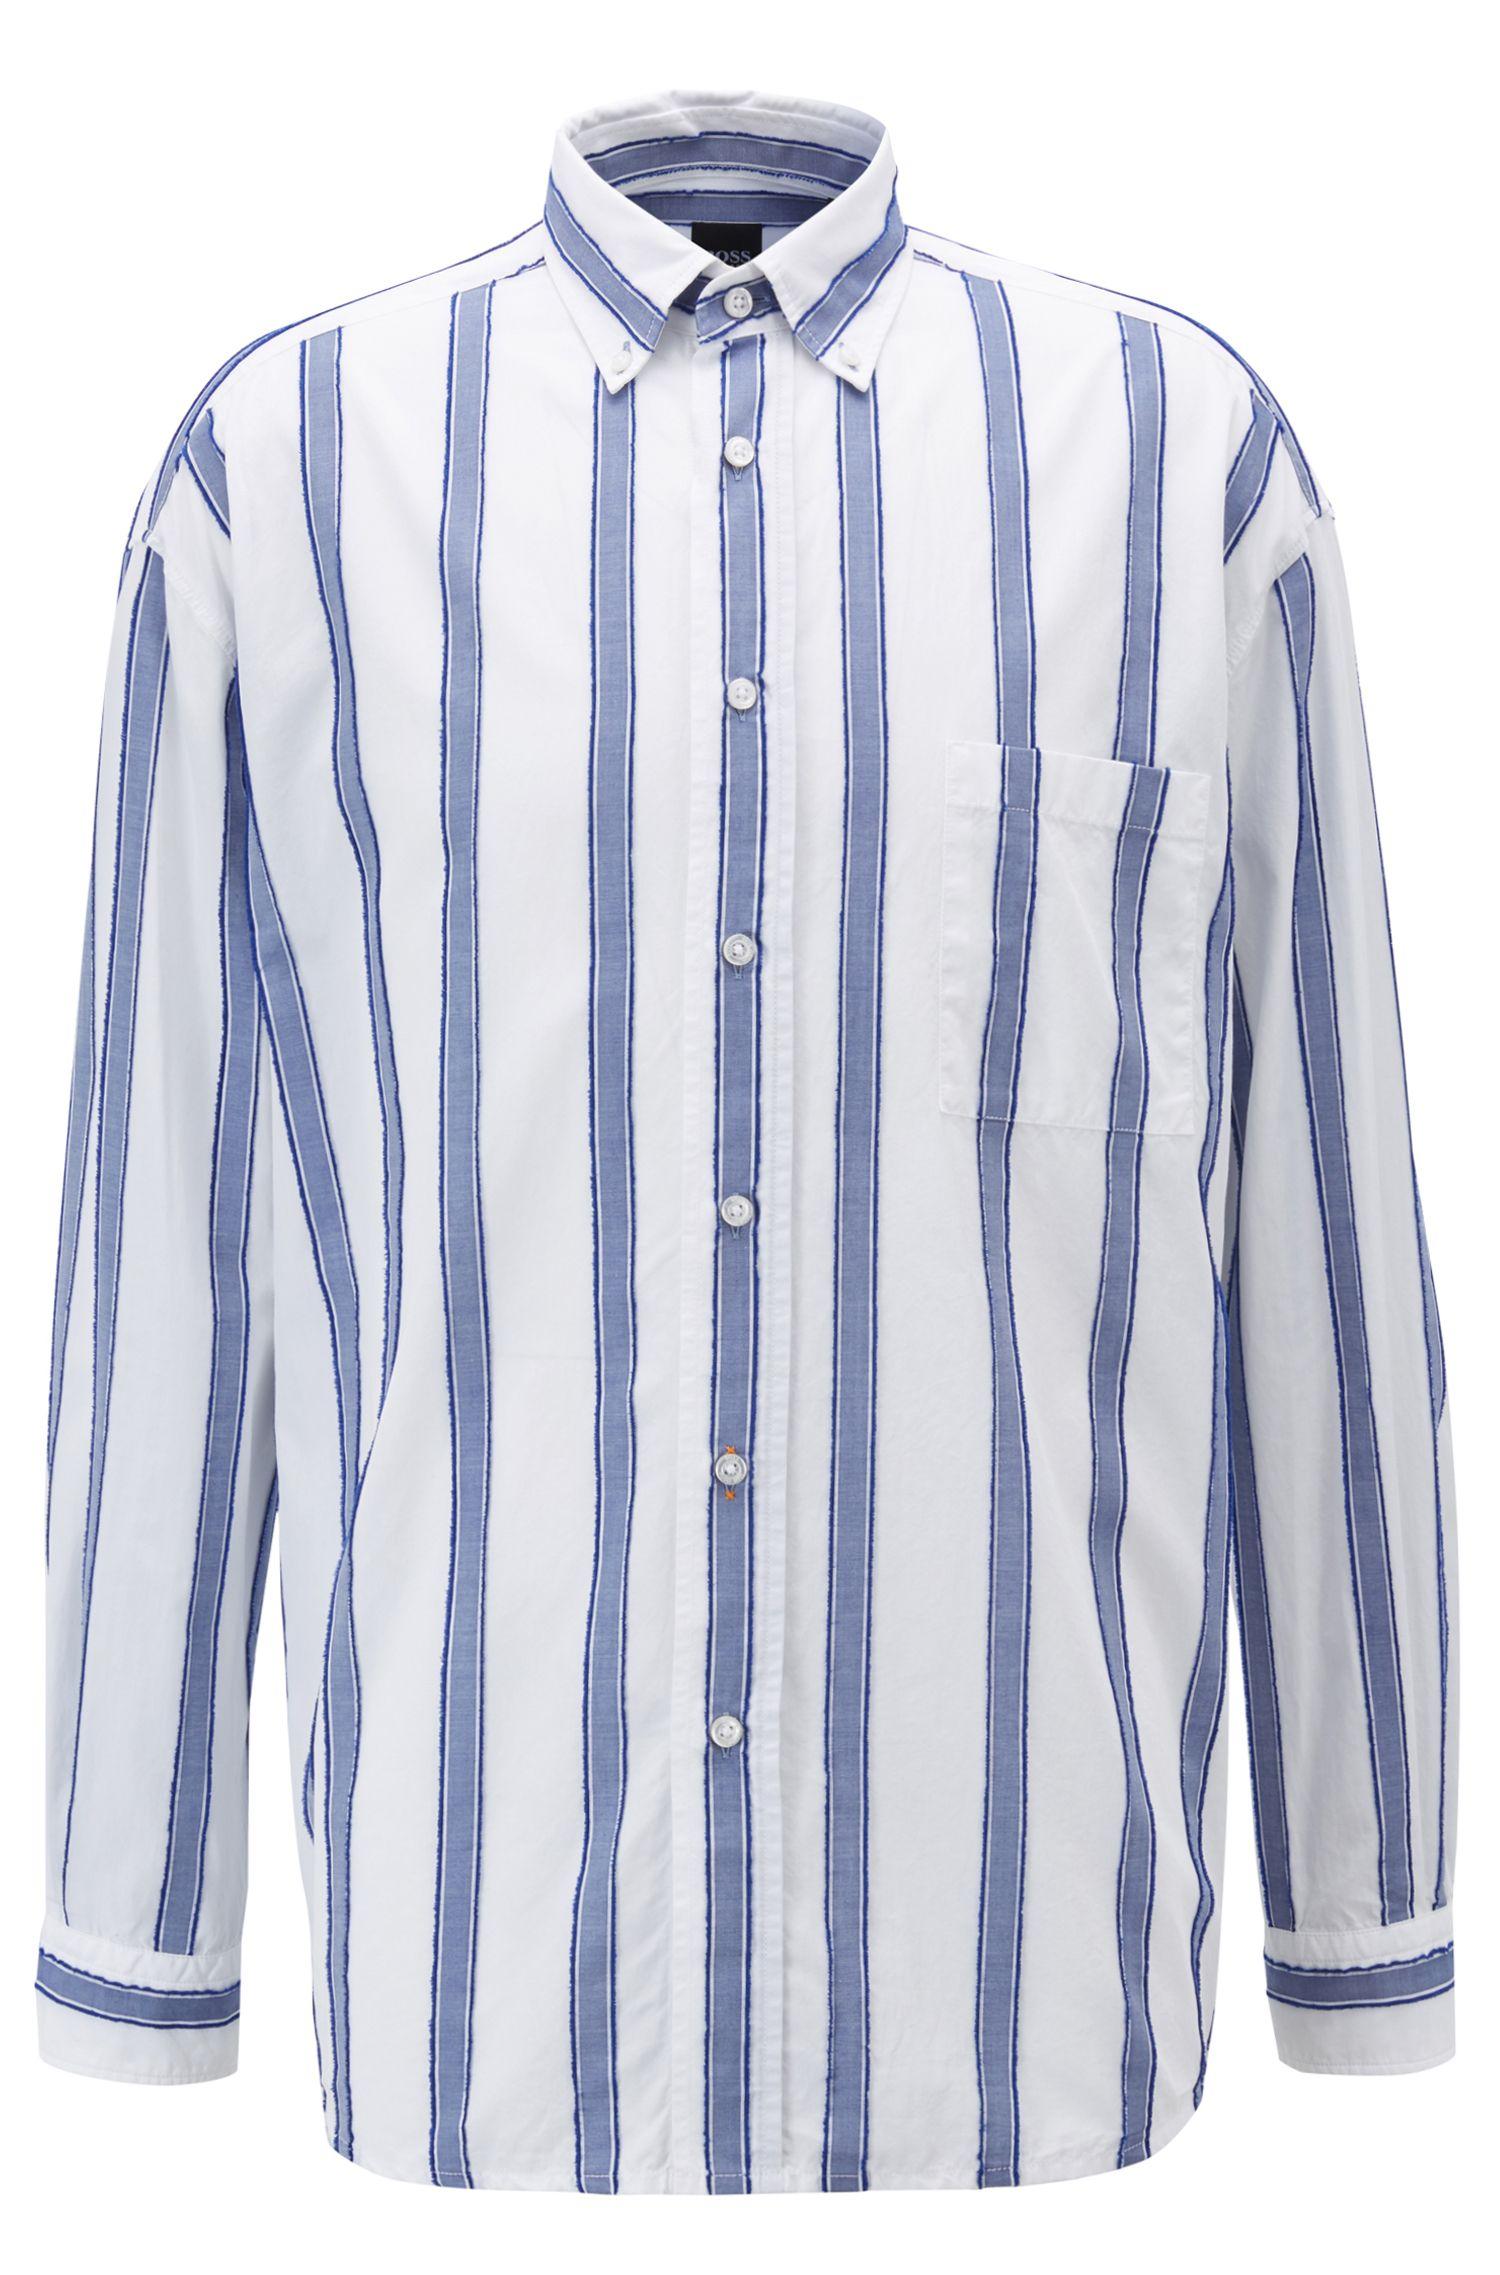 Camicia relaxed fit con righe in fil coupé, Blu scuro